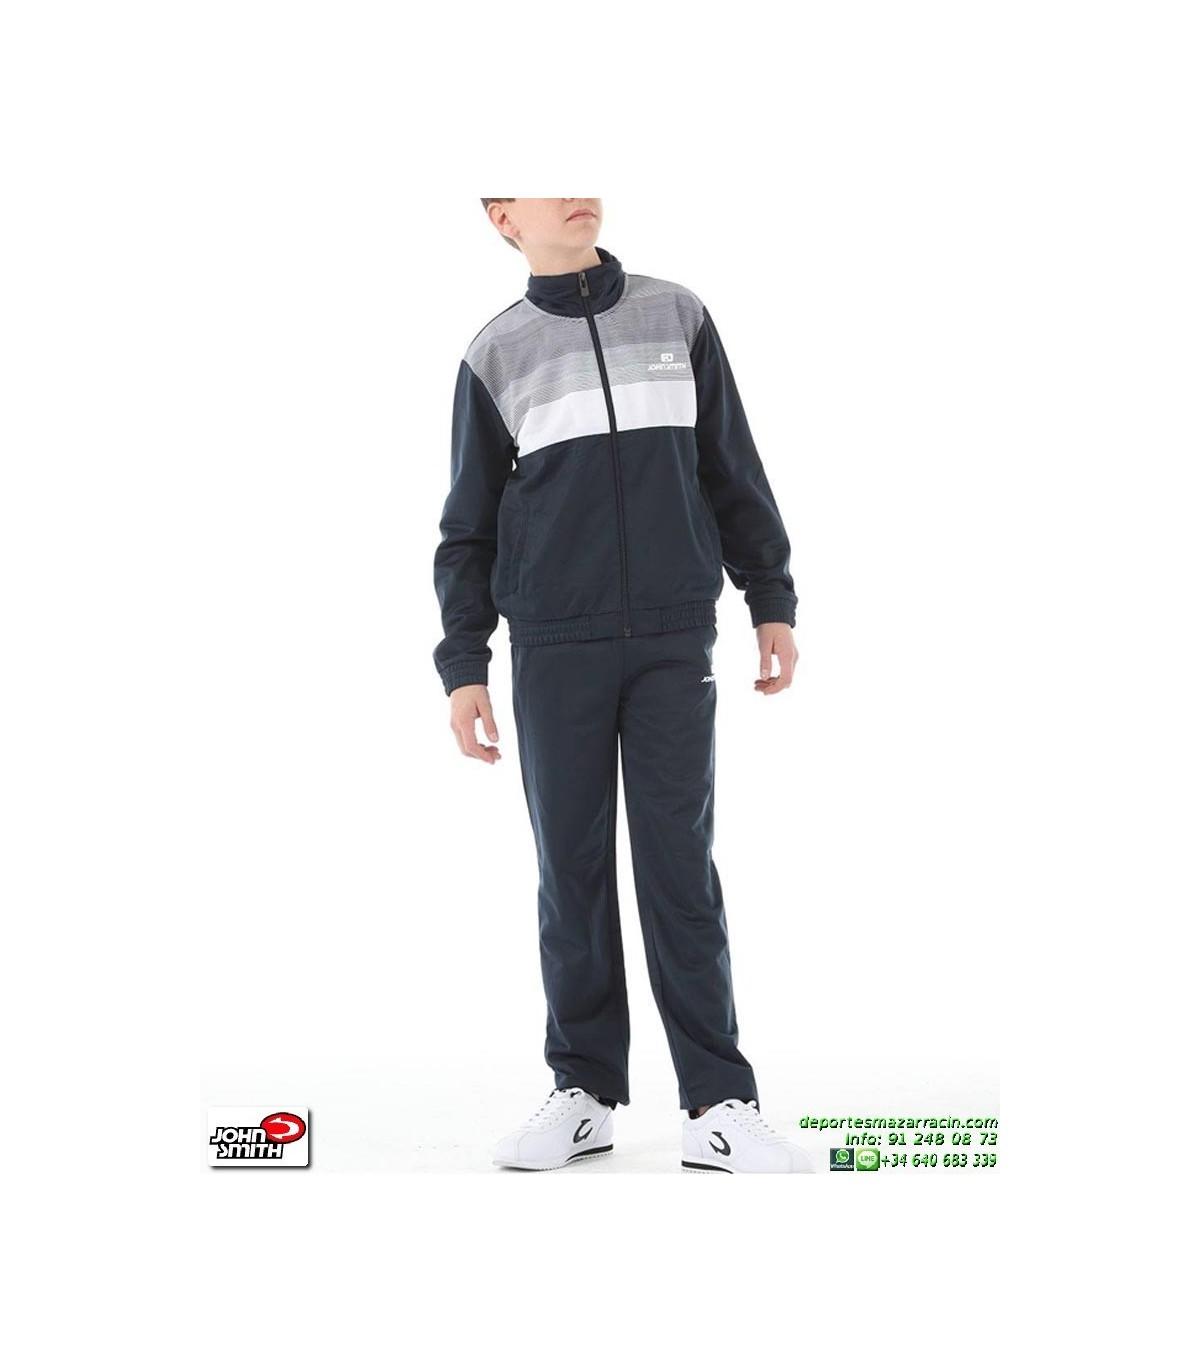 503f2a6ce1 Chandal Hombre John Smith CAMPULA Blanco-Marino Poliester acetato tracksuit  deporte conjunto chaqueta pantalon